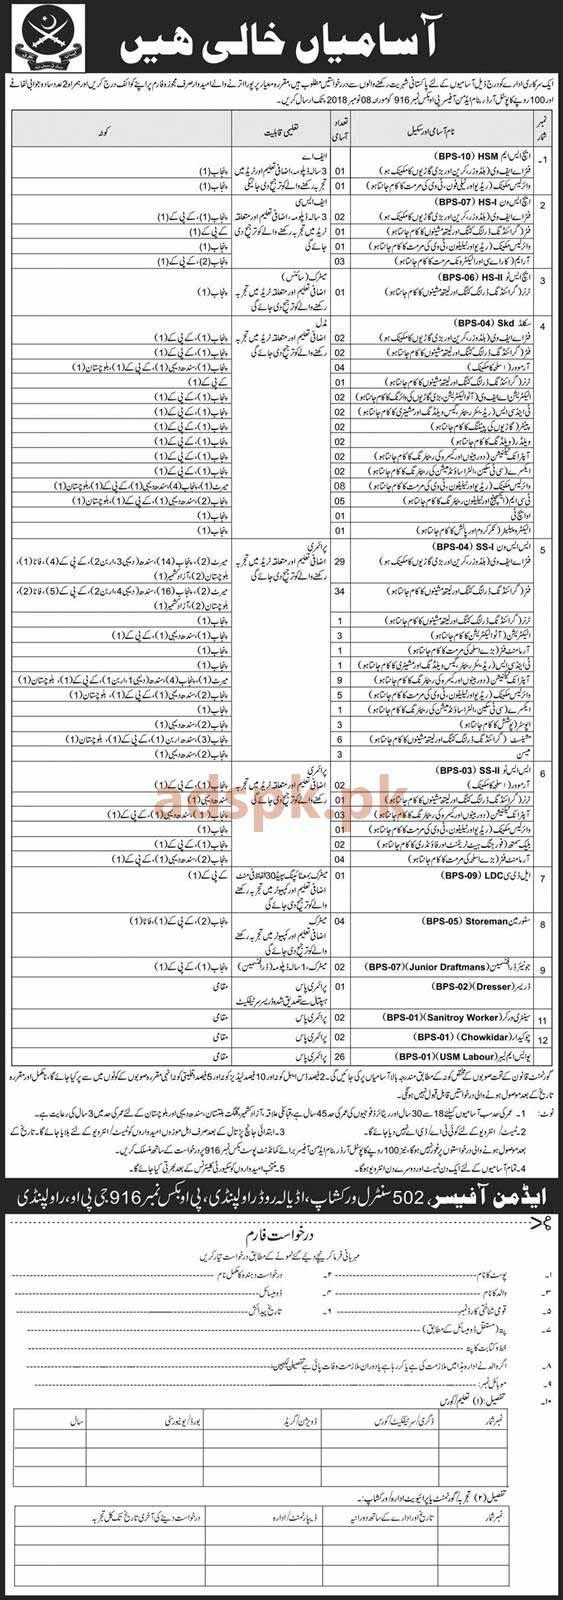 Government Organization PO Box 916 GPO Rawalpindi Jobs